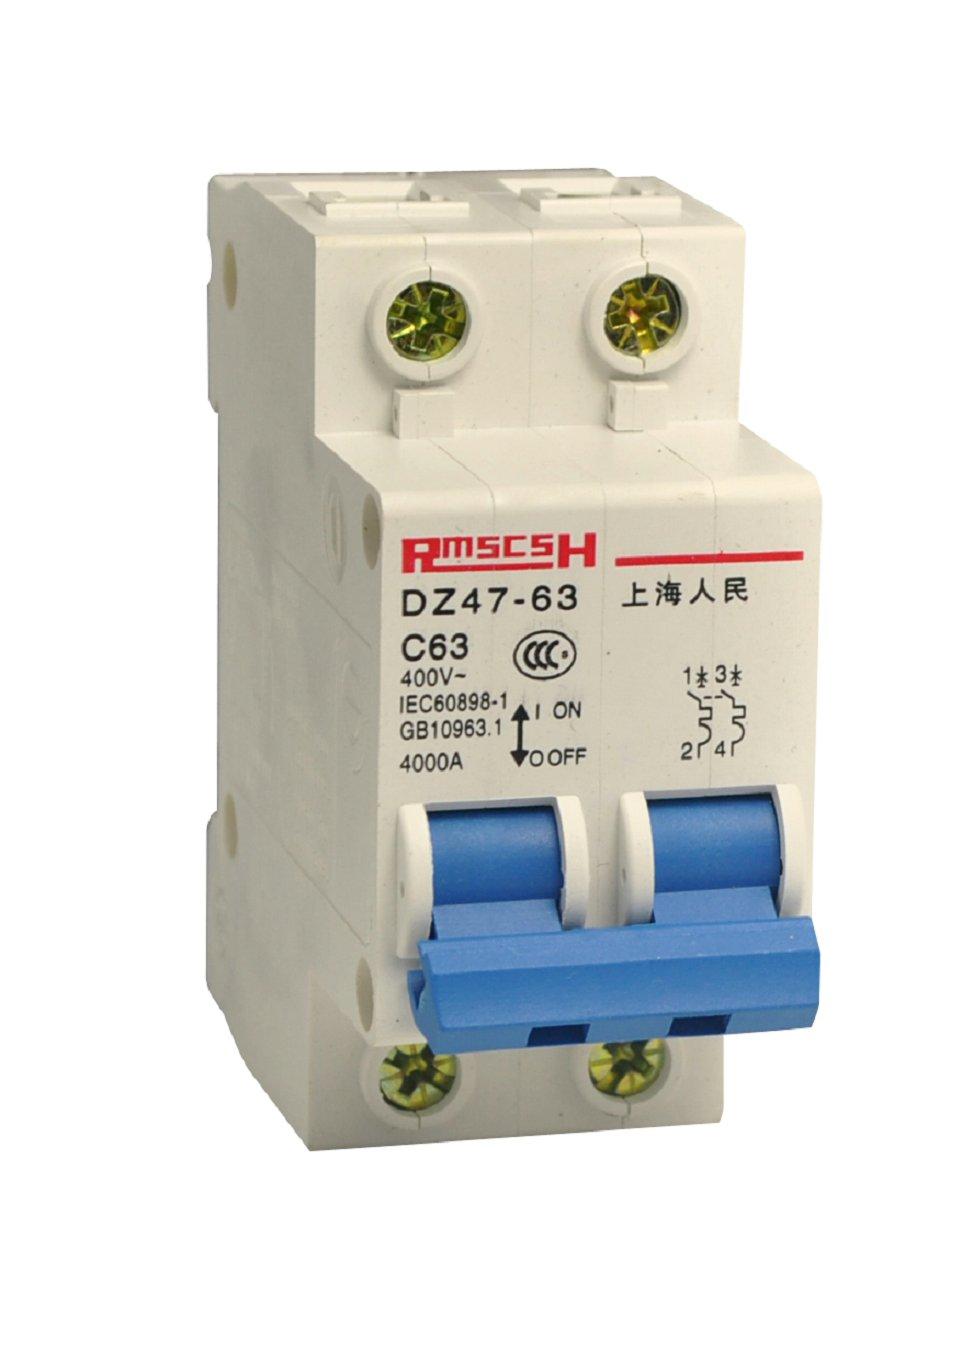 DZ47-63/C6 2P 上海人民电气(香港)有限公司是专业生产配电输电设备的生产企业,主要生产塑壳断路器、小型断路器,空气开关,漏电断路器,框架断路器,交流接触器等系列低压成套元器件。主要产品型号:断路器:RMM1、DZ10、DZ15、DZ20、DZ47、DZ15LD;RMM1L、DZ10LE、DZ15LE、DZ20LE、DZ47LE.